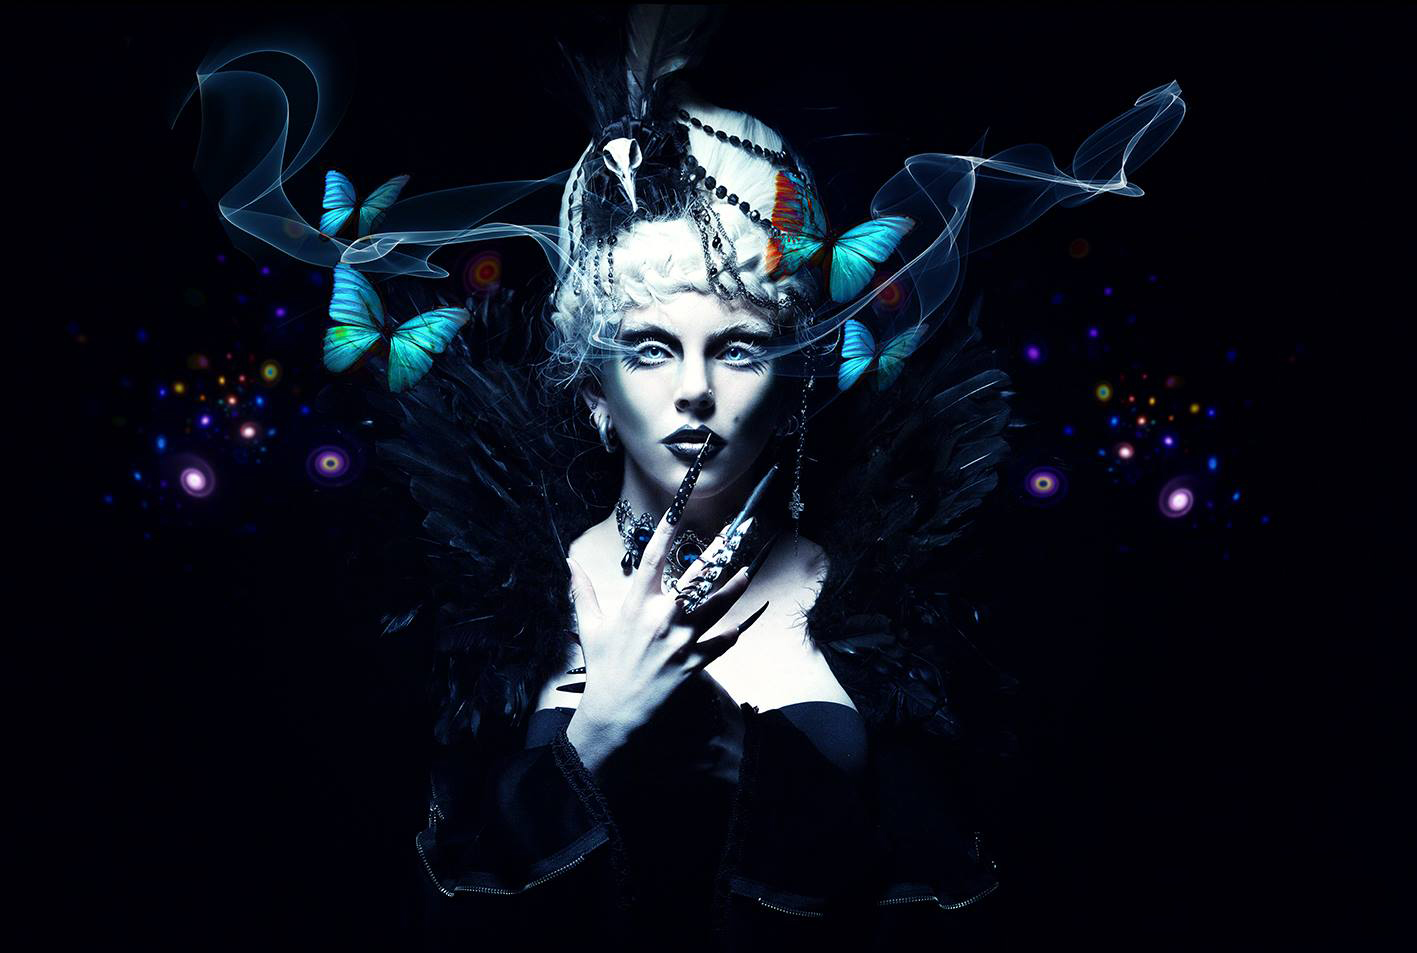 Senangelis Photography - Miss Twisted - makeup 'Mon Cherie' Makeup - wardrobe Asylum Dollz